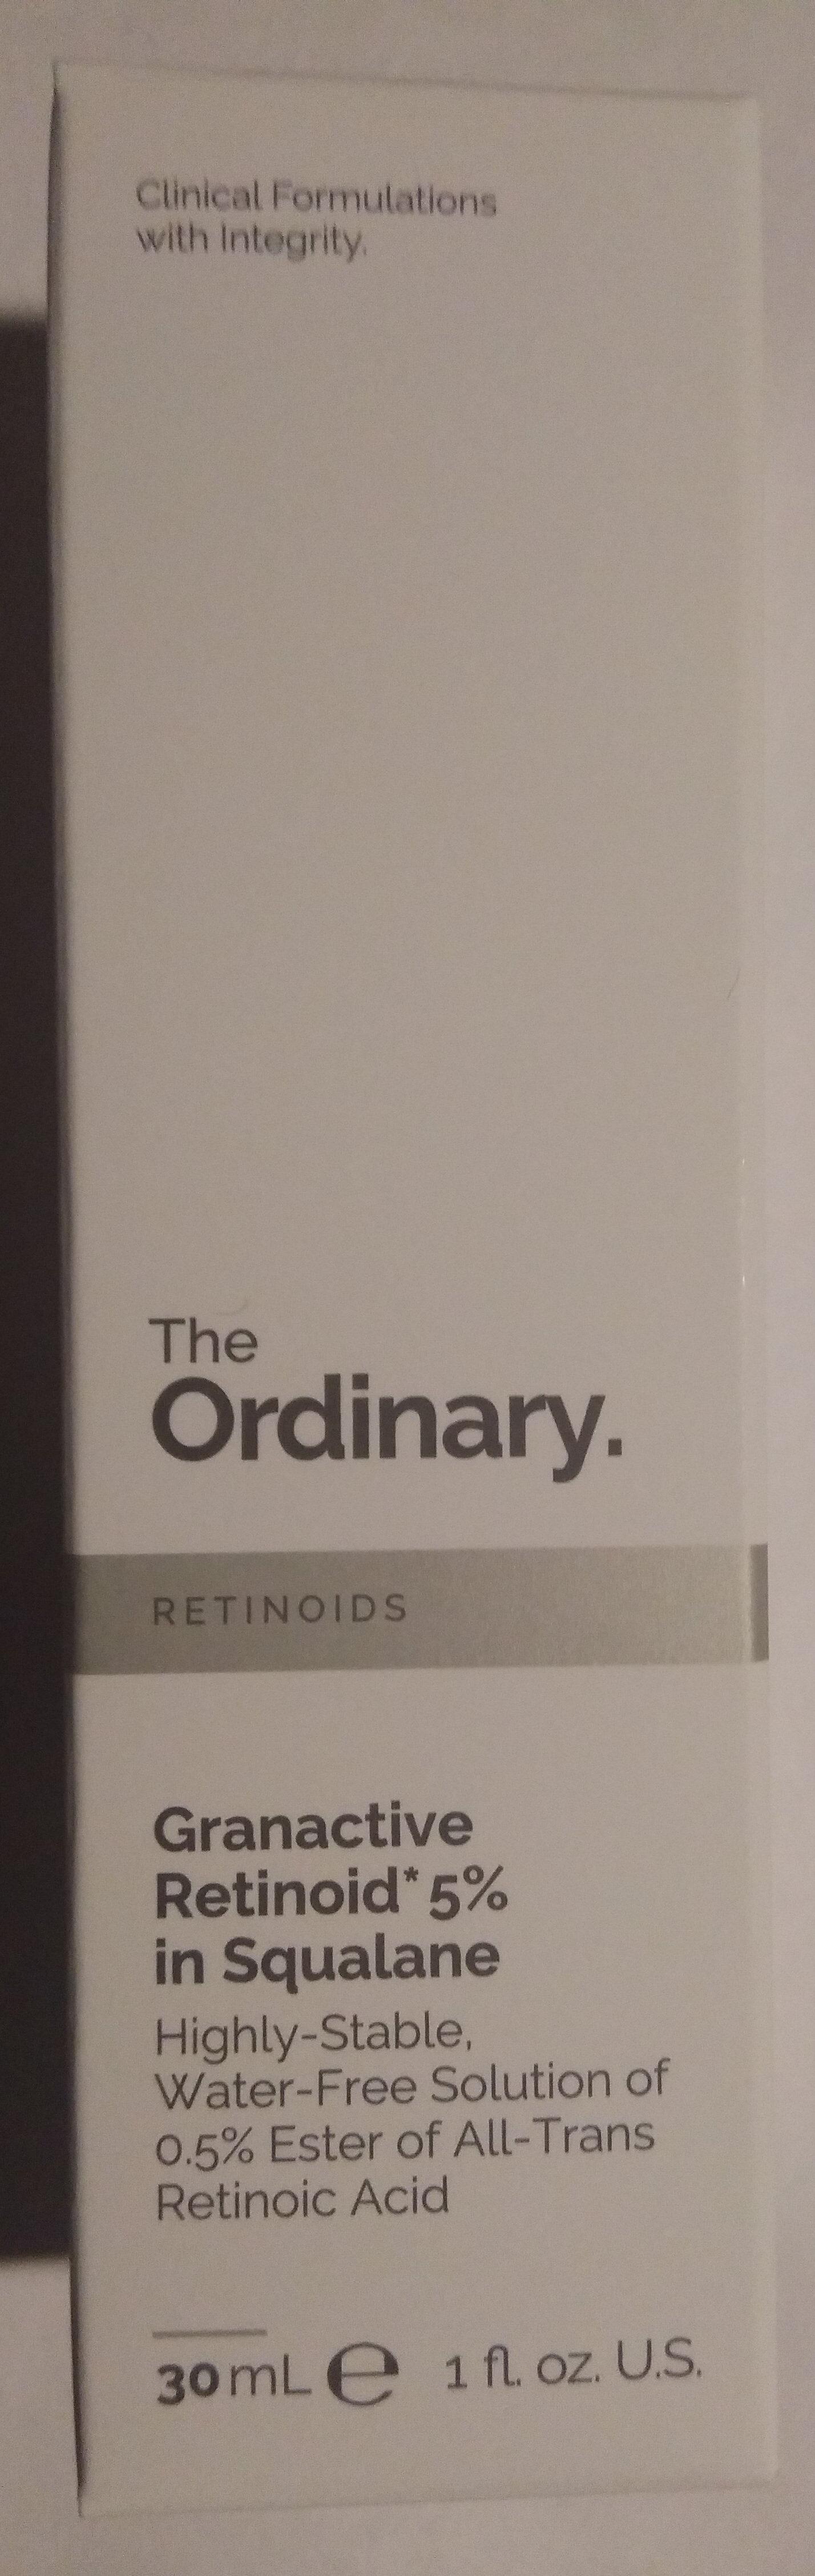 Granactive Retinoid 5% in Squalane - Product - en